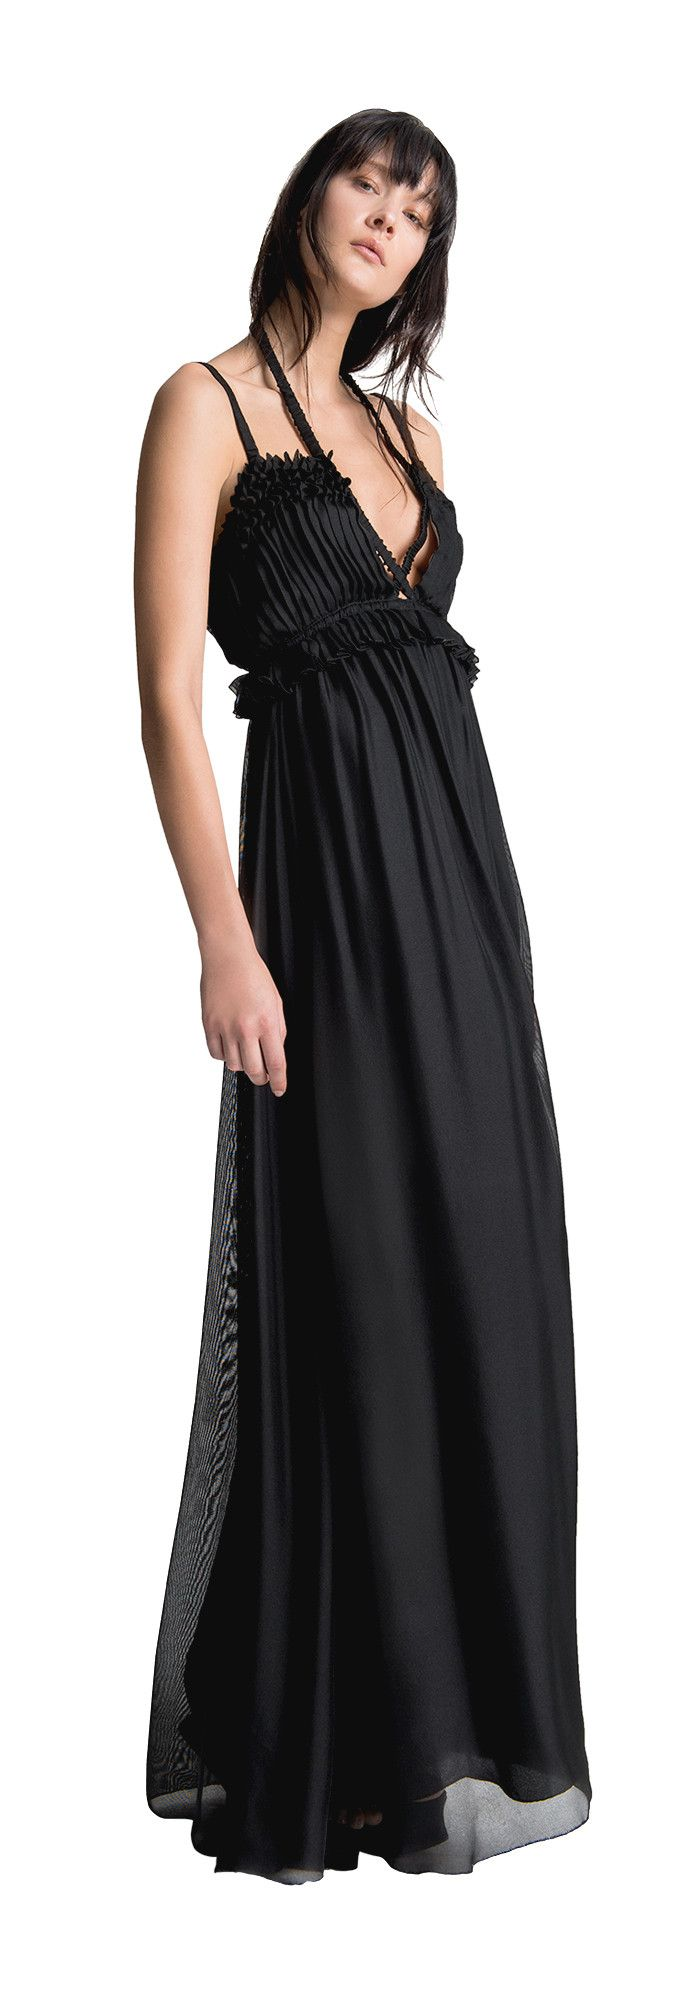 Silk mesh long dress the shirred pleating the ruffles the